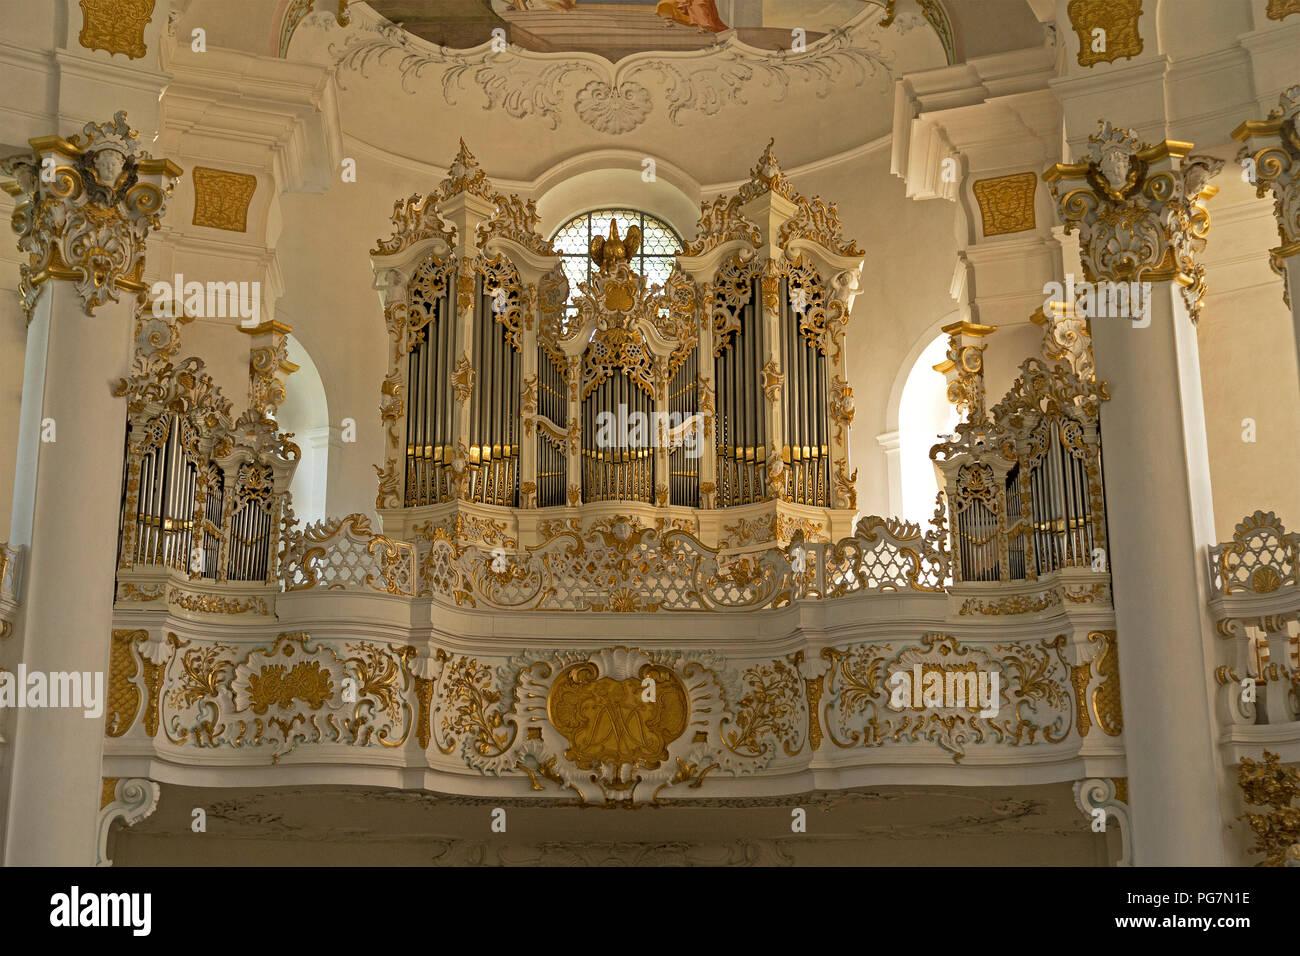 organ front, Wieskirche (Pilgrimmage Church of Wies) near Steingaden, Allgaeu, Bavaria, Germany - Stock Image